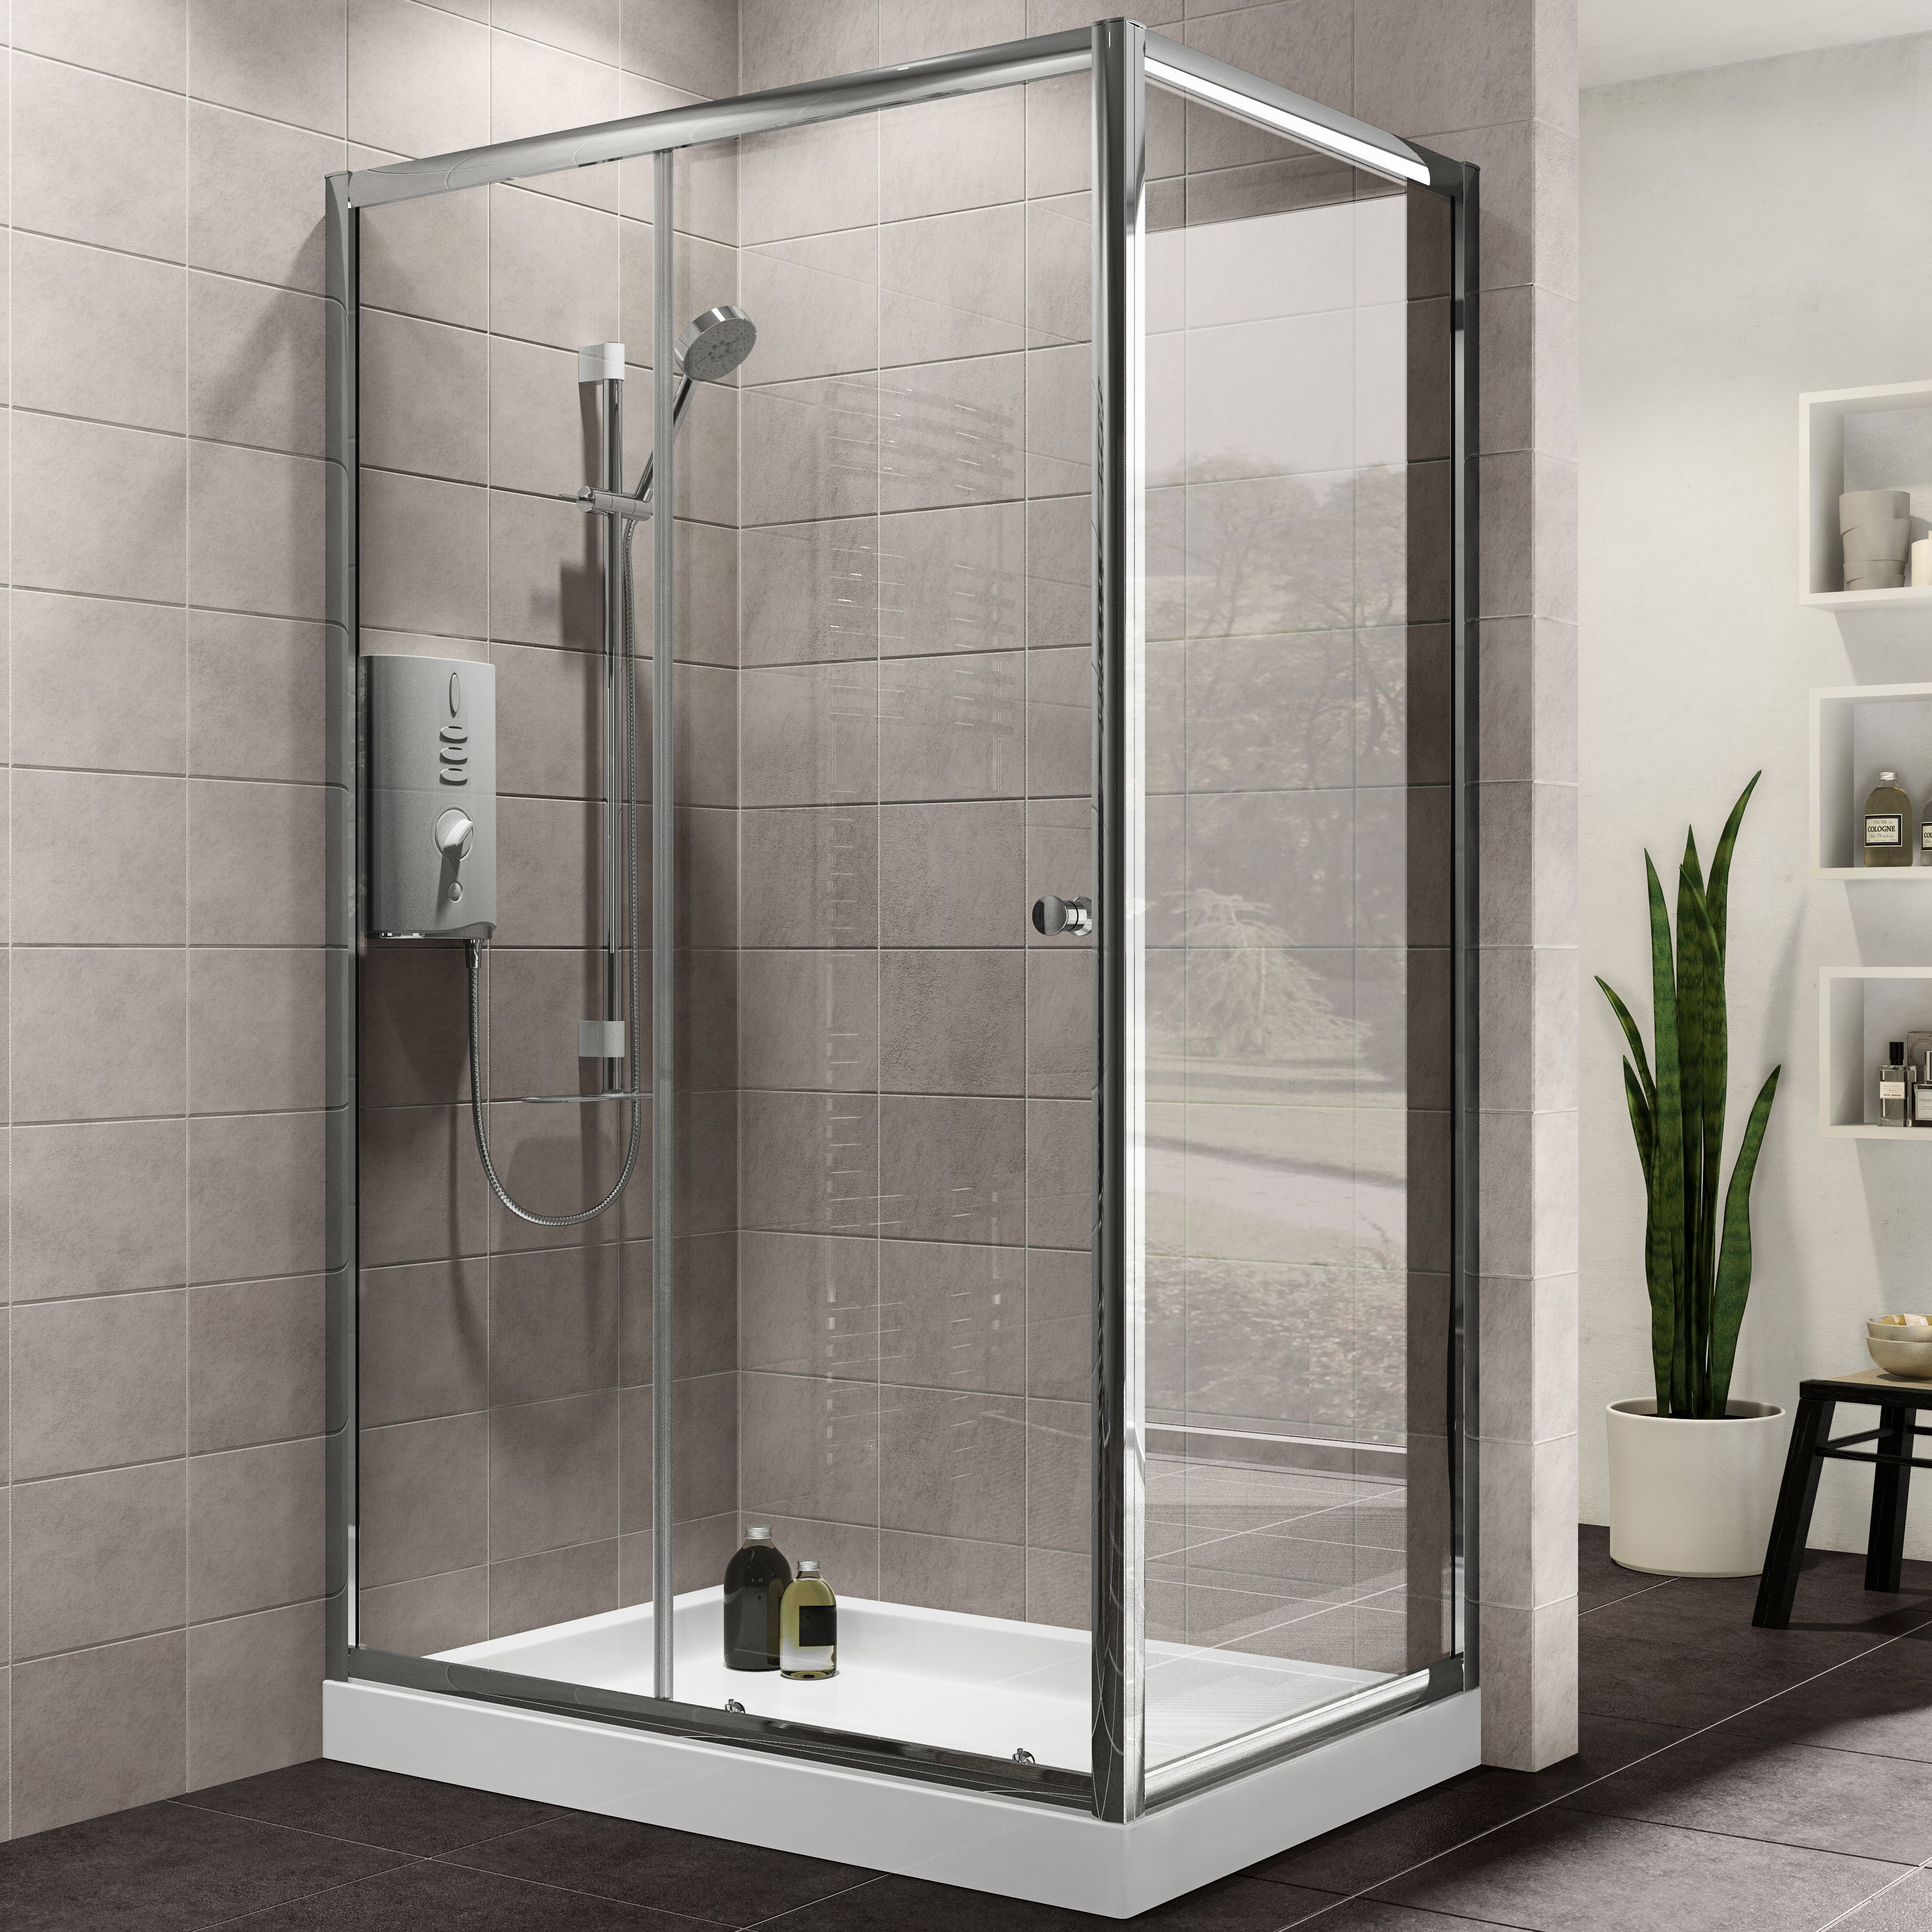 Plumbsure Rectangular Shower Enclosure Tray Amp Waste Pack